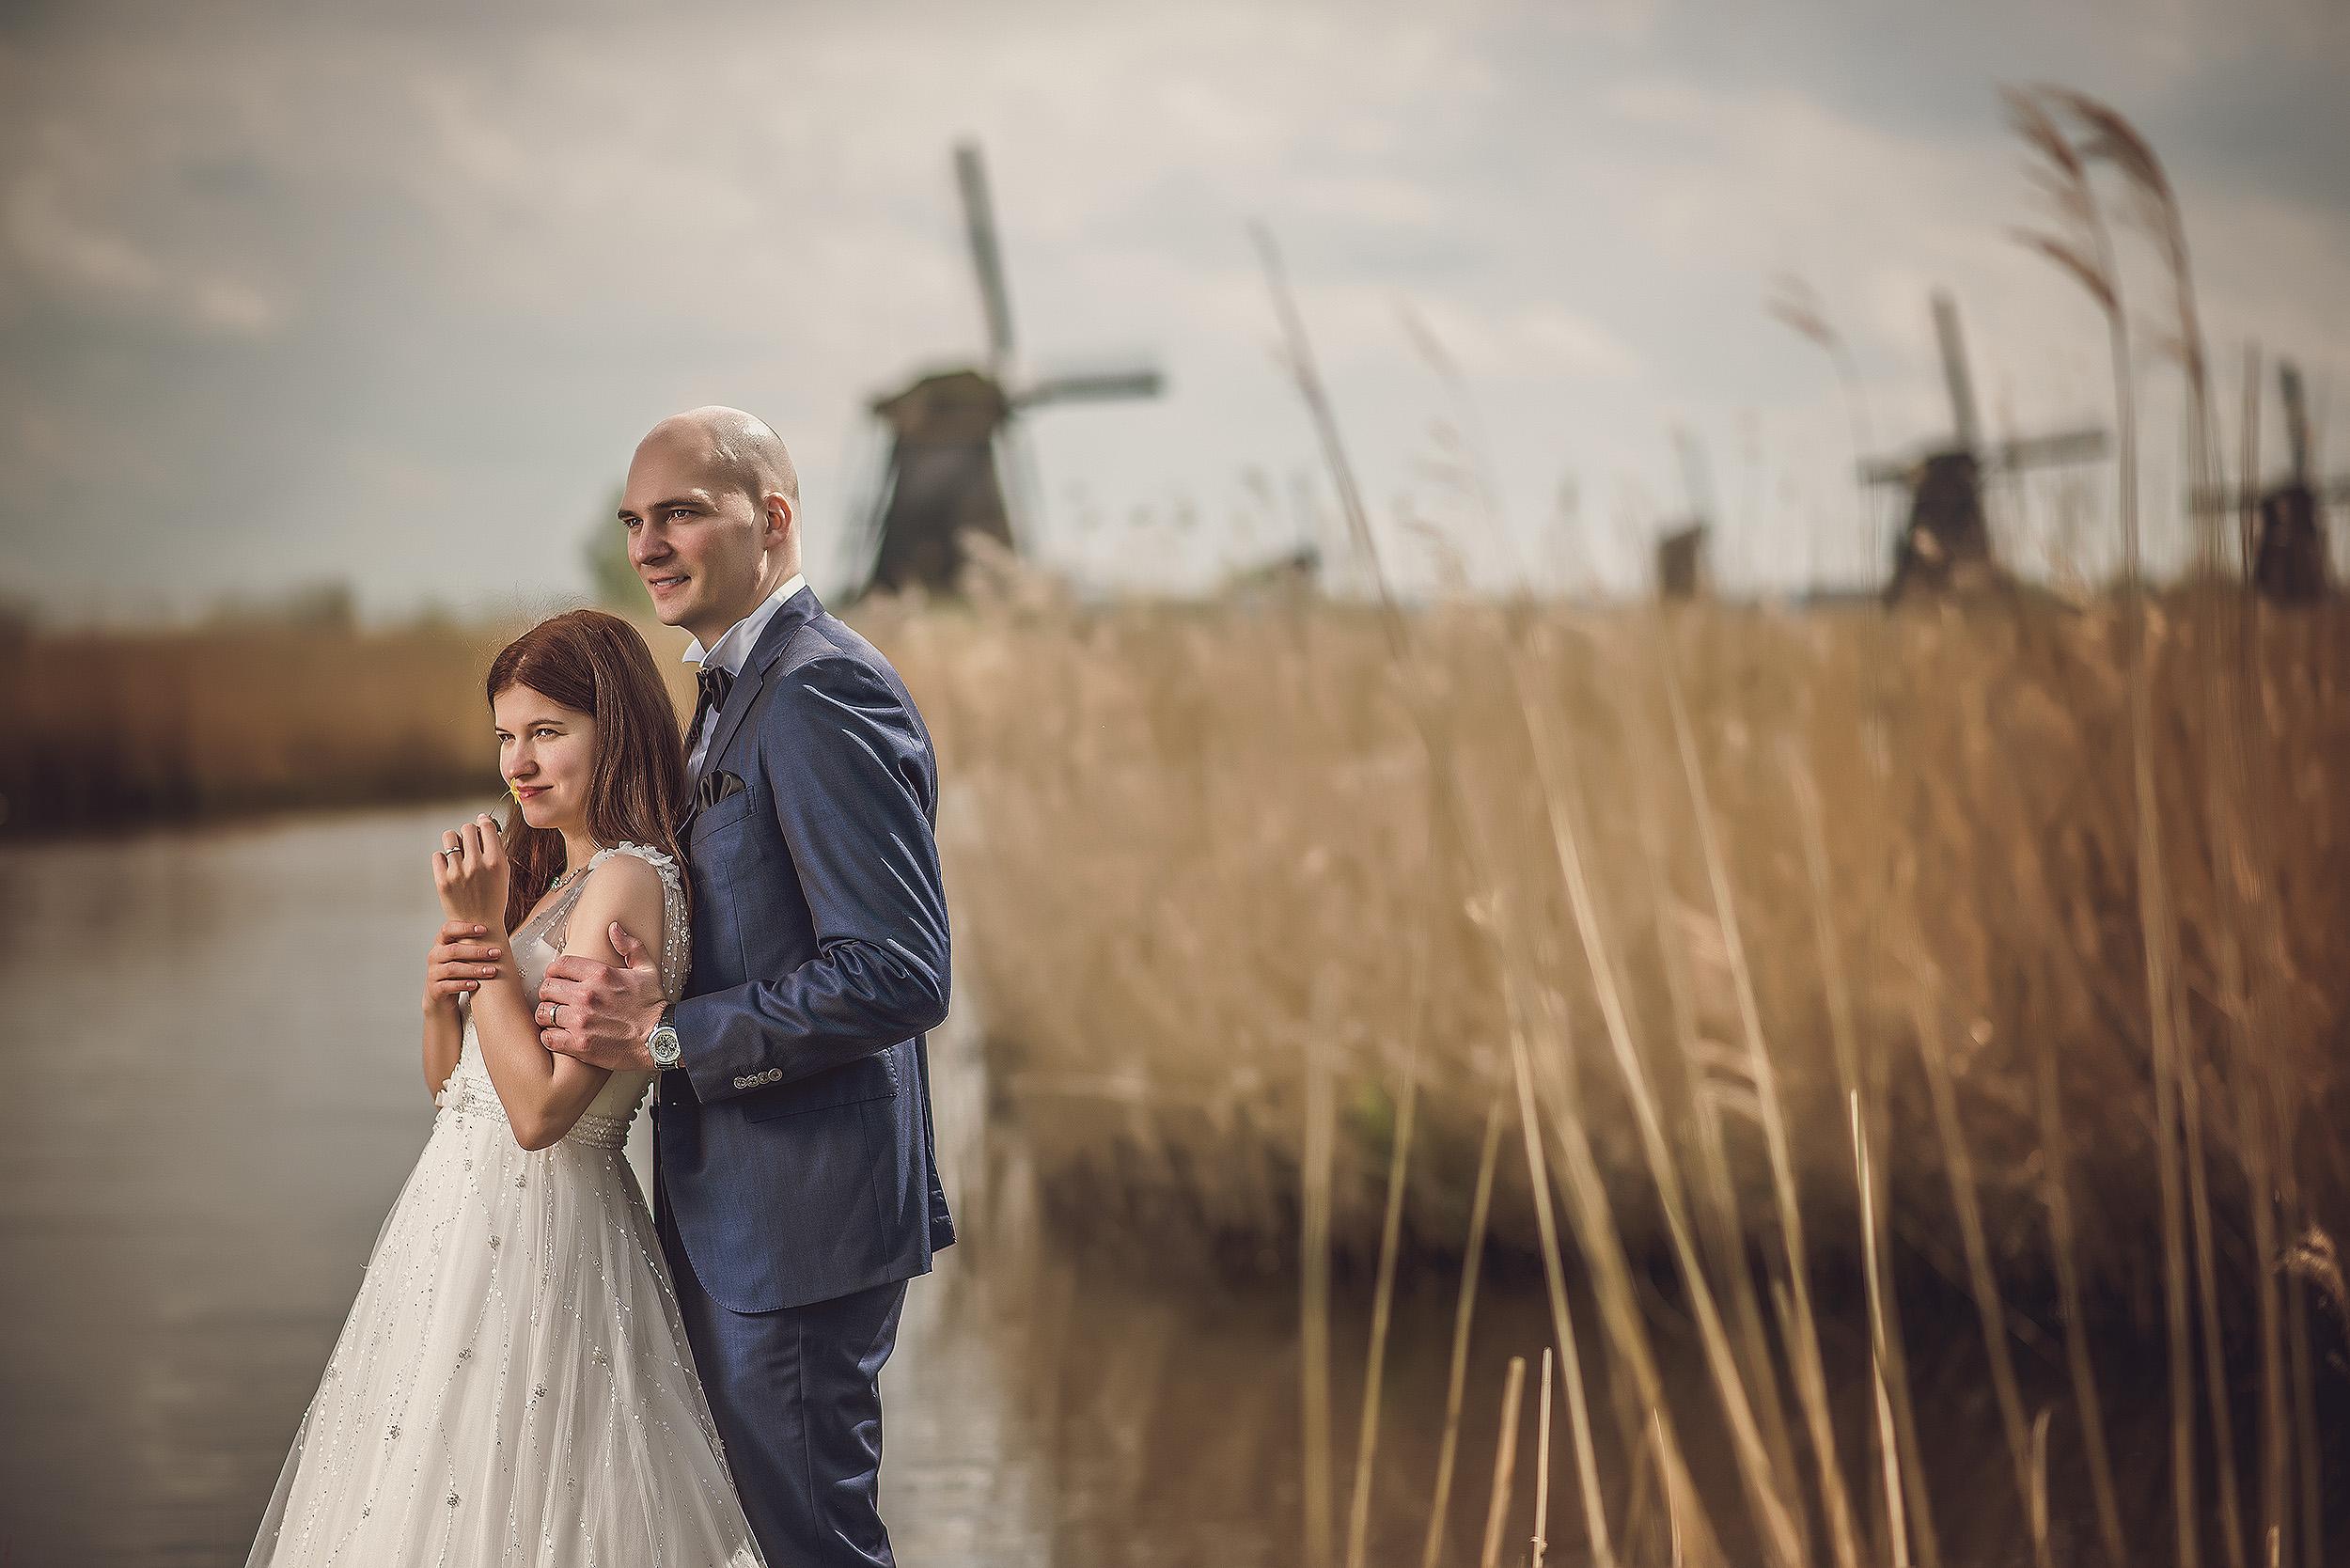 Martijn & Silvana